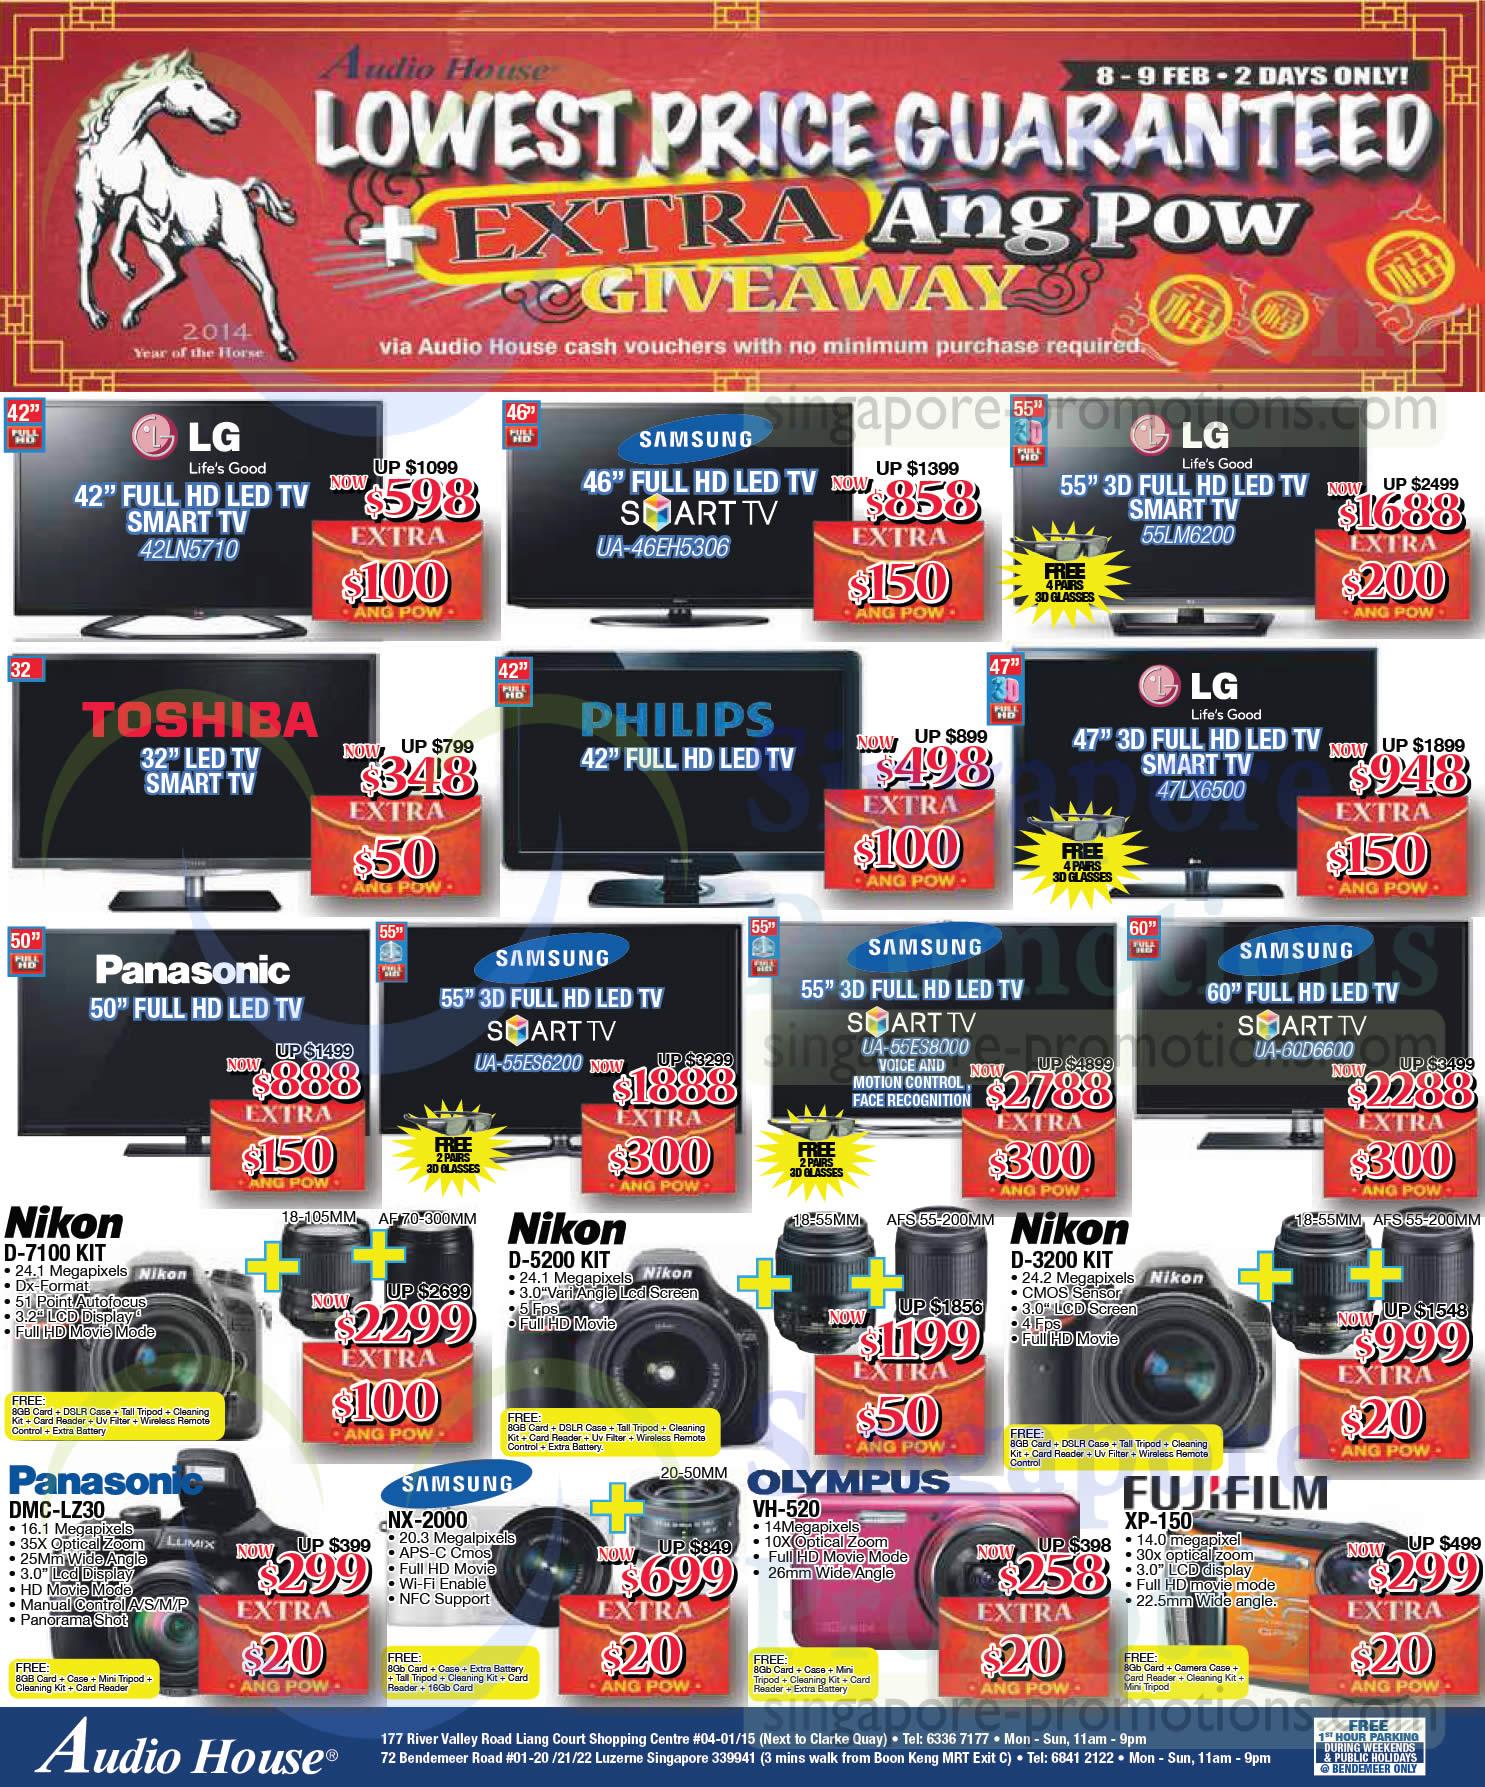 LG 42LN5710 TV, Samsung UA46EH5306 TV, LG 55LM6200 TV, LG 47LX6500 TV, Samsung UA55ES6200 TV, Samsung UA55ES8000 TV, Samsung UA60D6600 TV, Nikon D7100 DSLR Digital Camera, Nikon D5200 DSLR Digital Camera, Nikon D3200 DSLR Digital Camera, Panasonic DMC-LZ30 Digital Camera, Samsung NX-2000 Digital Camera, Olympus VH-520 Digital Camera and Fujifilm XP-150 Digital Camera